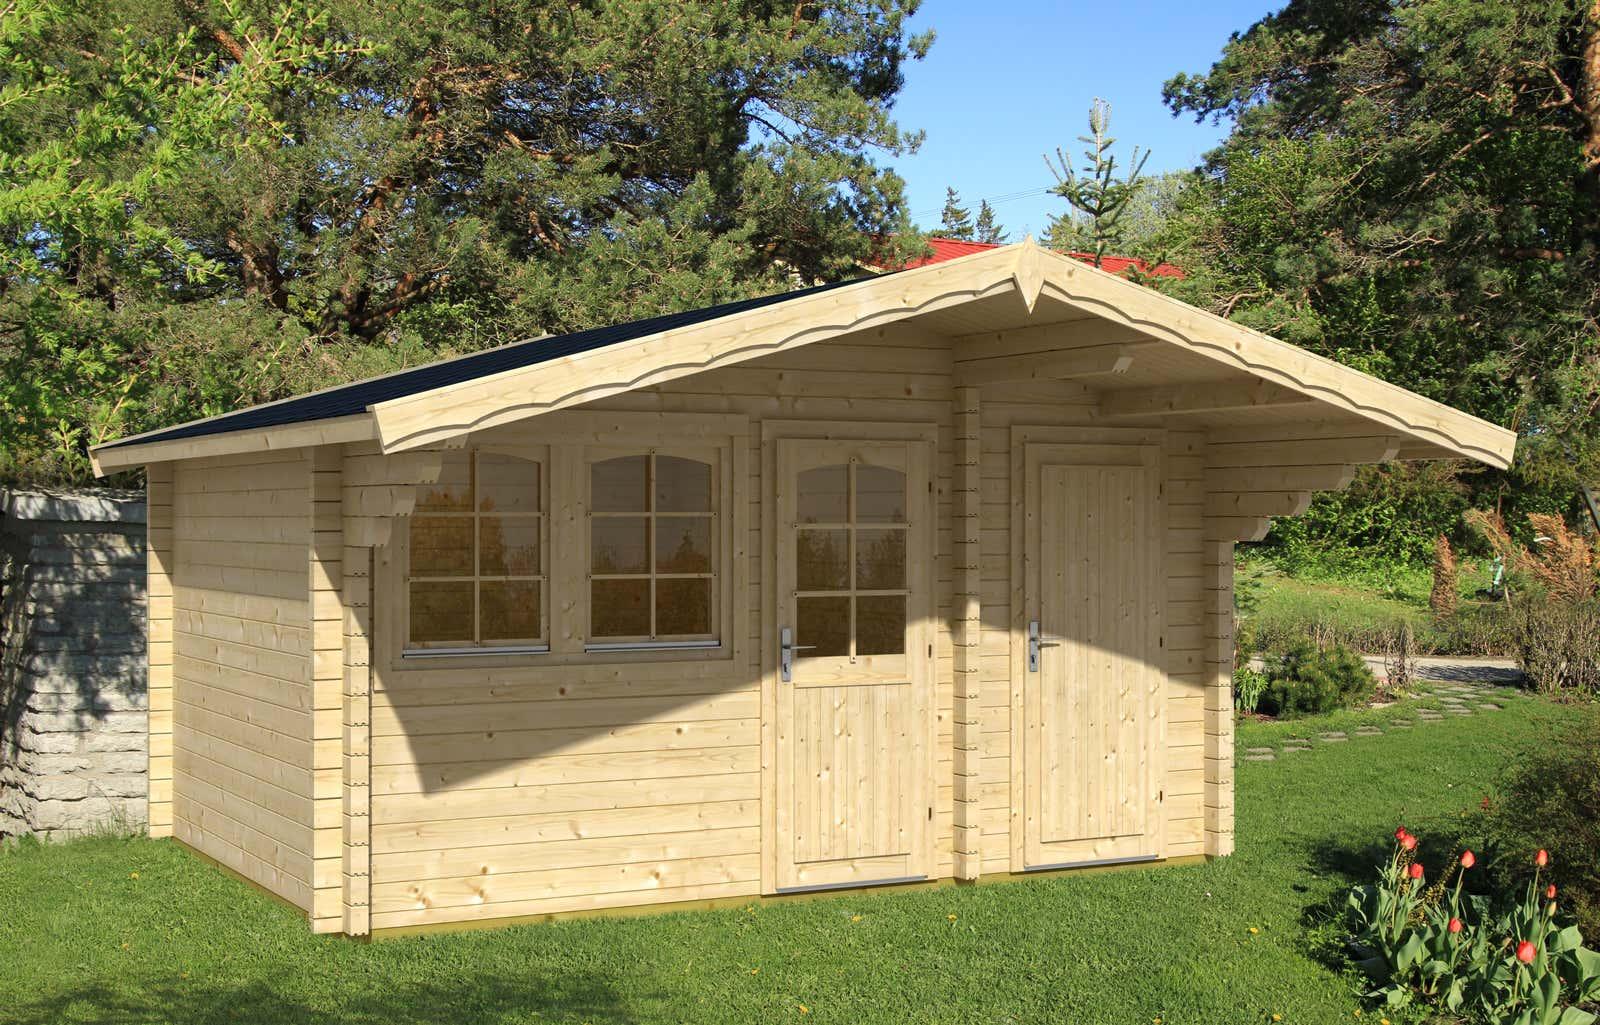 gartenhaus modell pedro 70 b 111721 a z gartenhaus gmbh. Black Bedroom Furniture Sets. Home Design Ideas